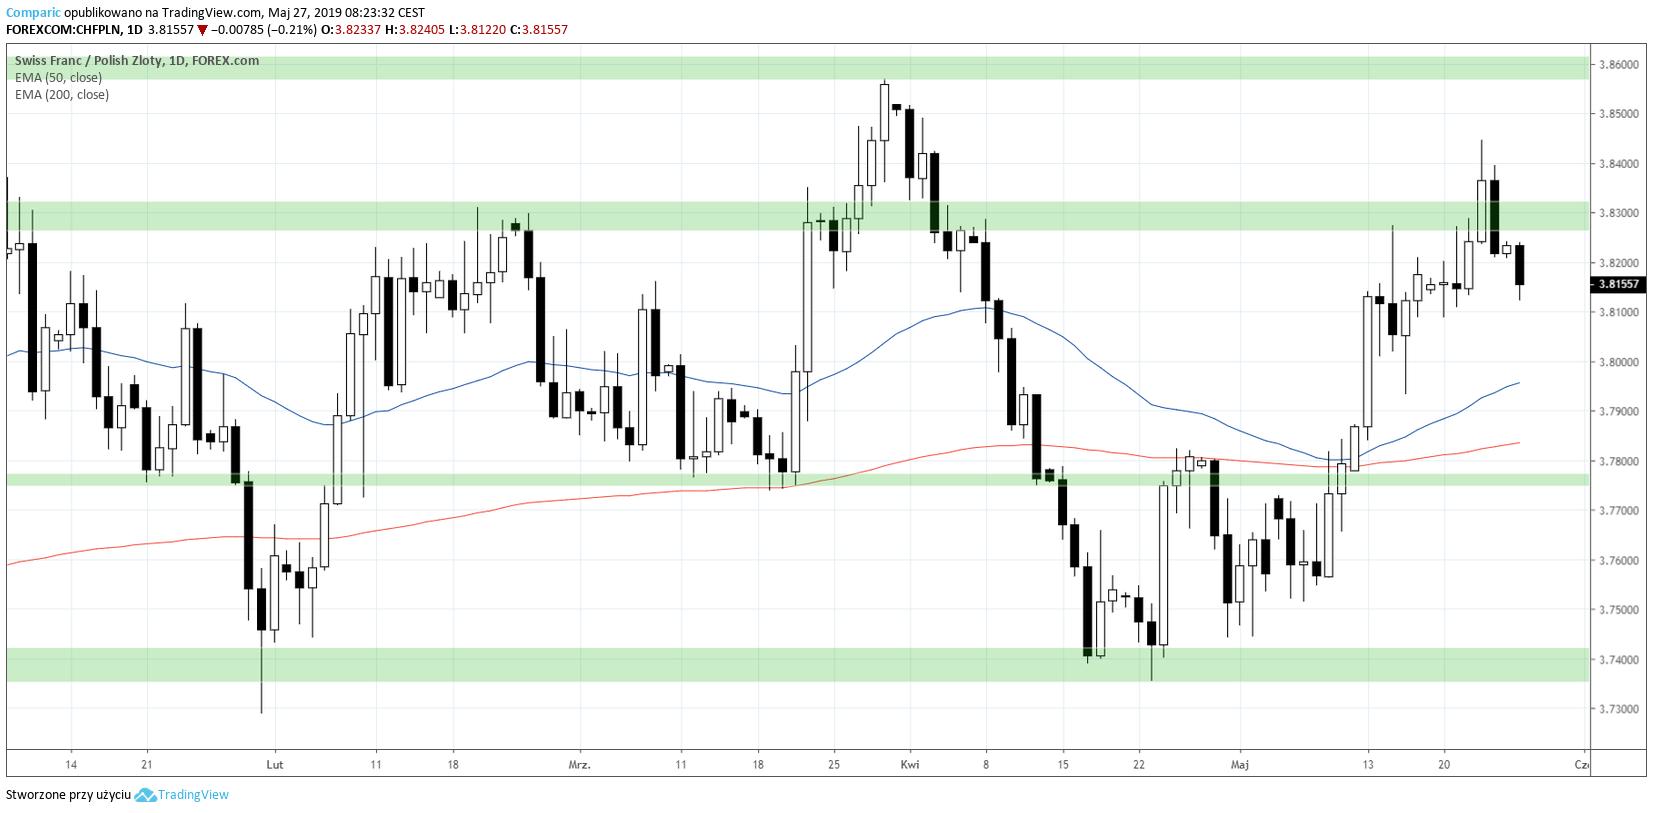 kurs franka 27 maja 2019